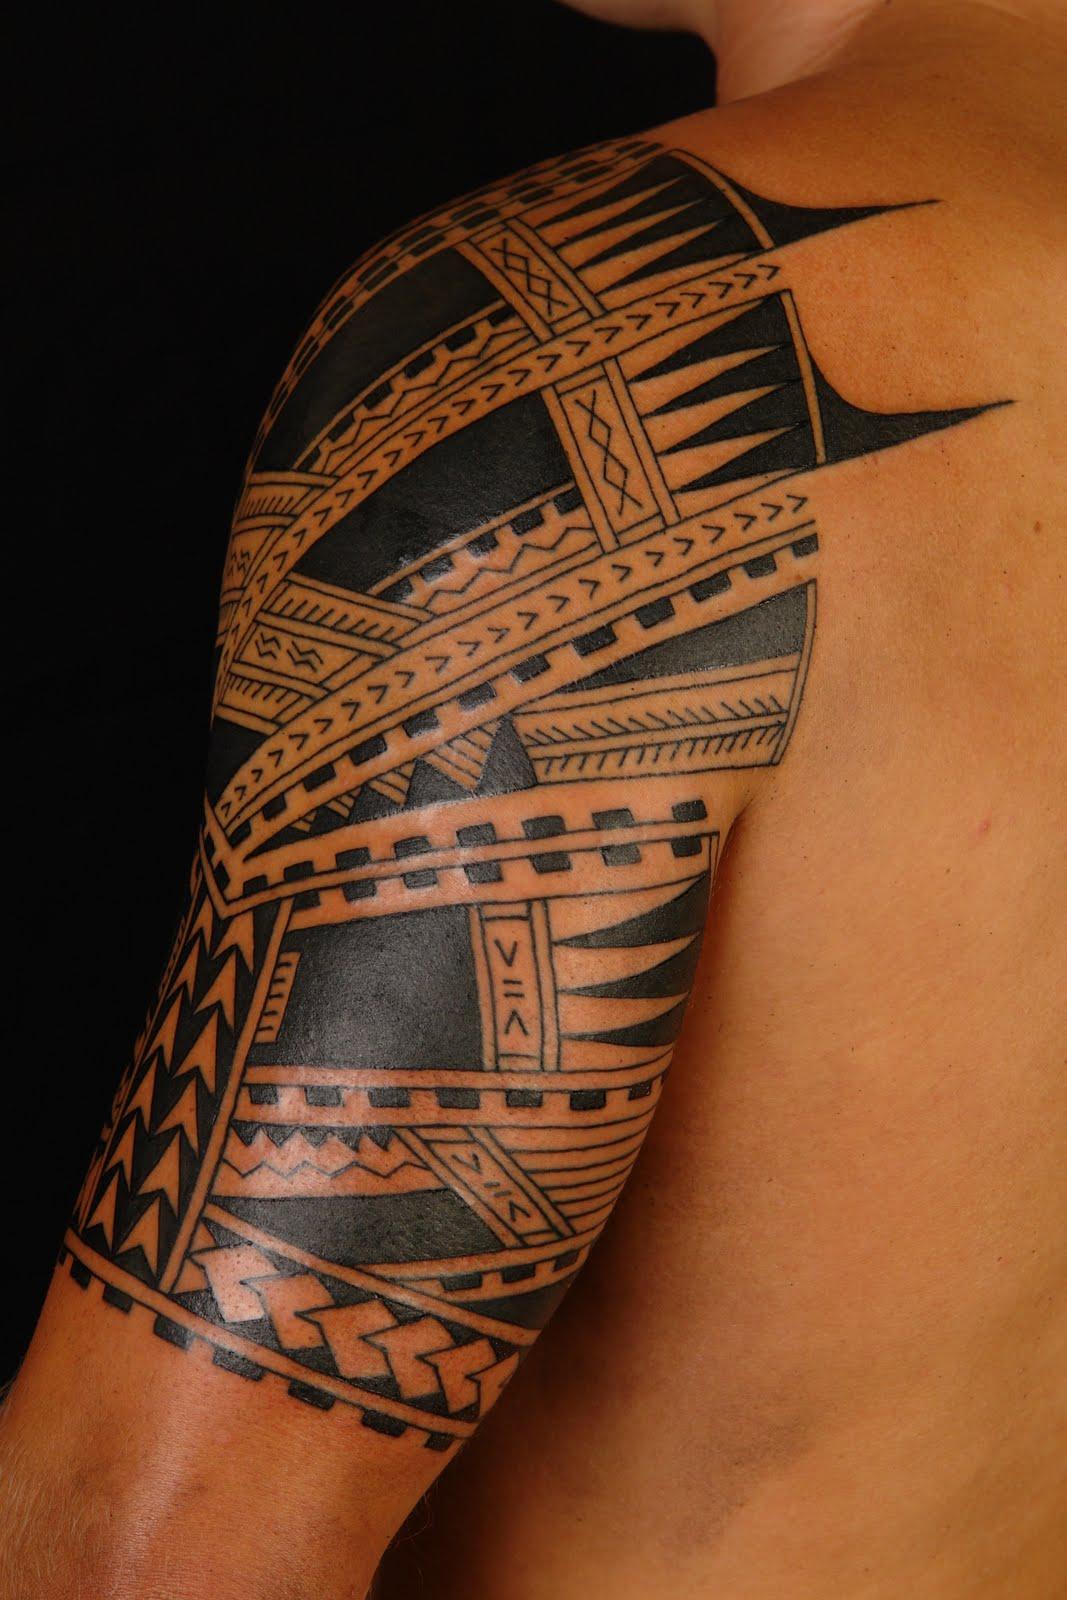 Tattoos for men love marino ursić marinoursic on pinterest